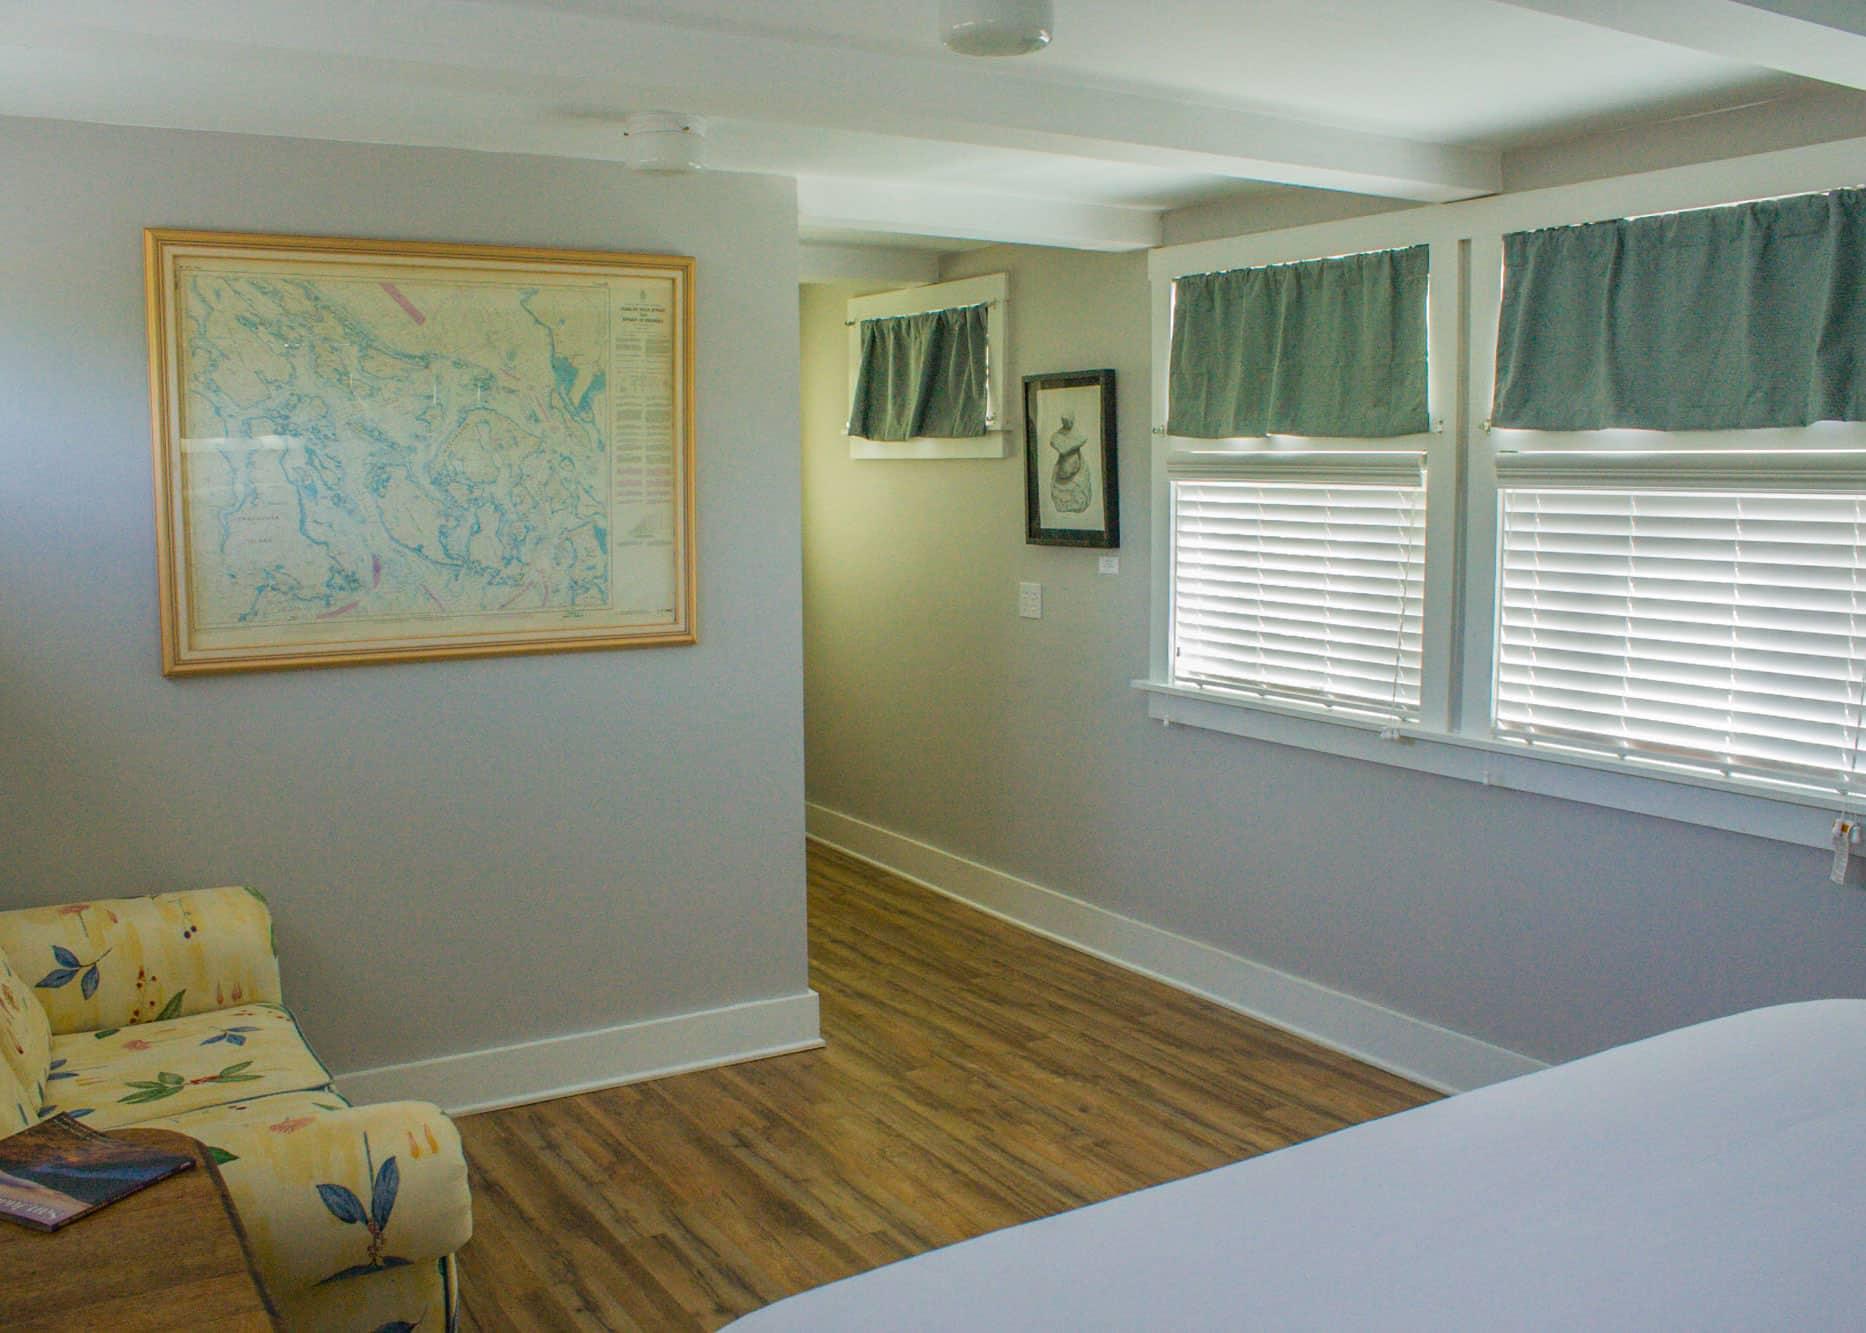 the-edenwild-inn-lopez-island-lodging-2020-room-09-04